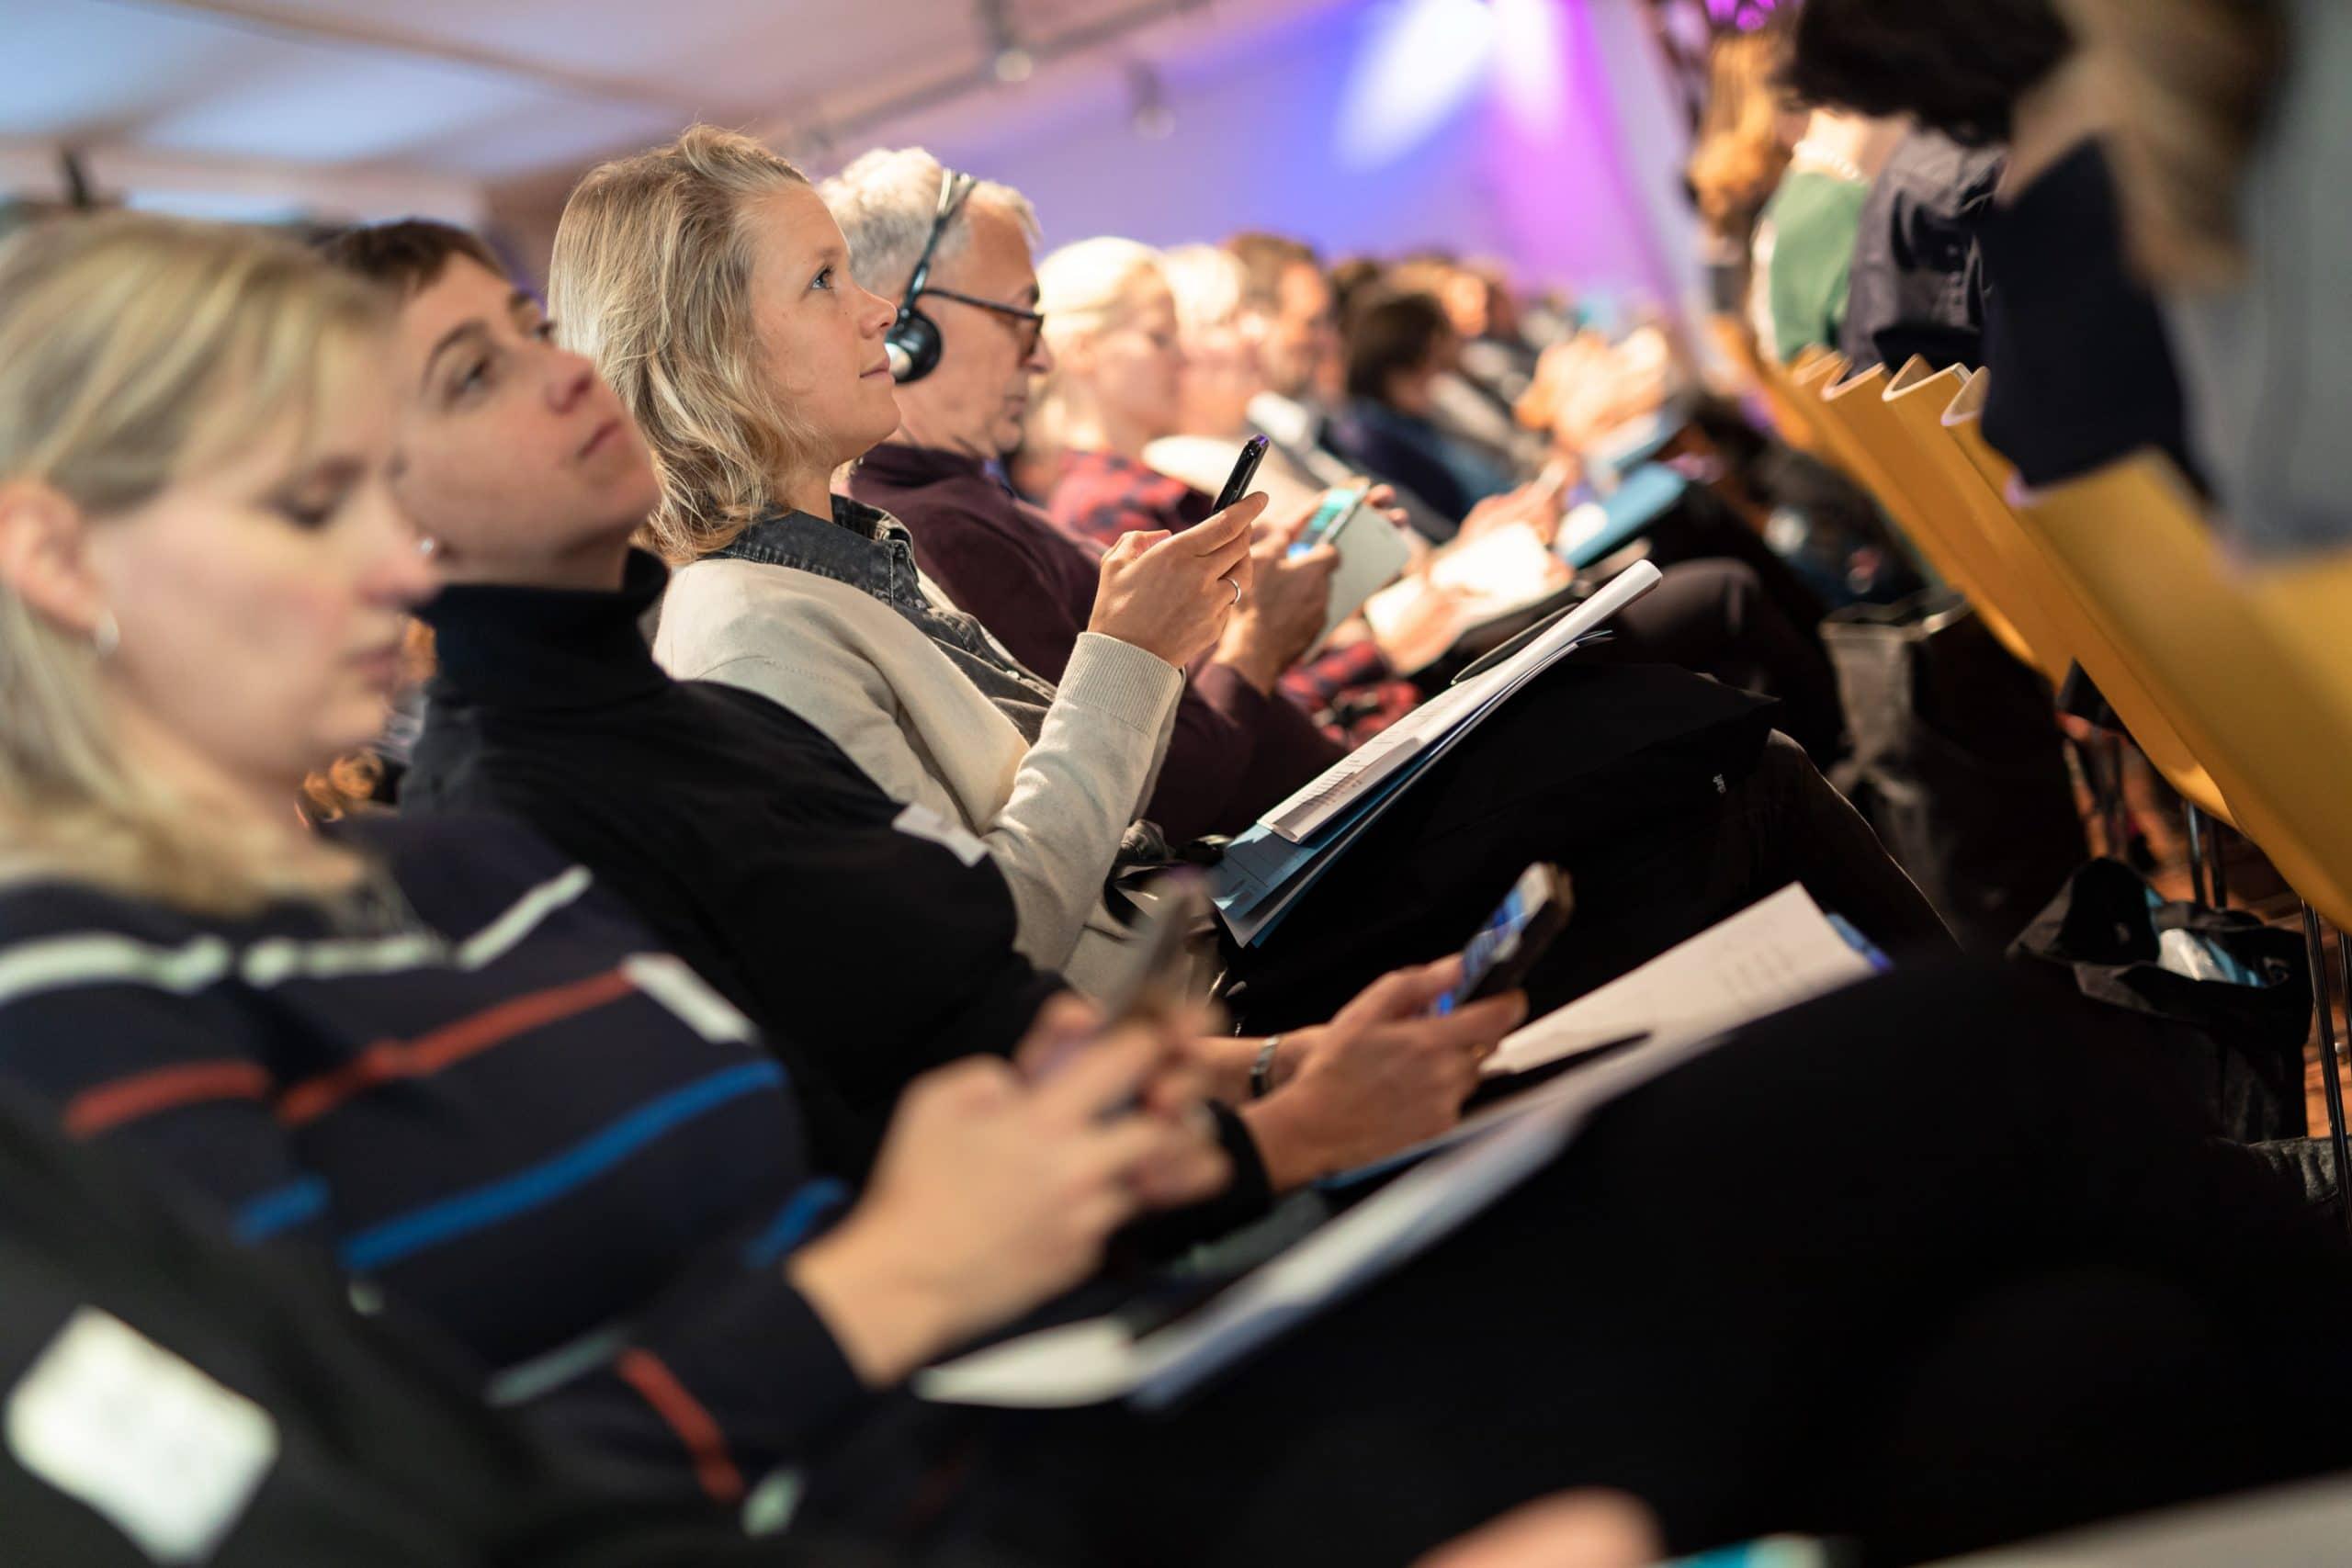 Internationale Fachkonferenz | Kalkscheune, Berlin – 30.10.2019